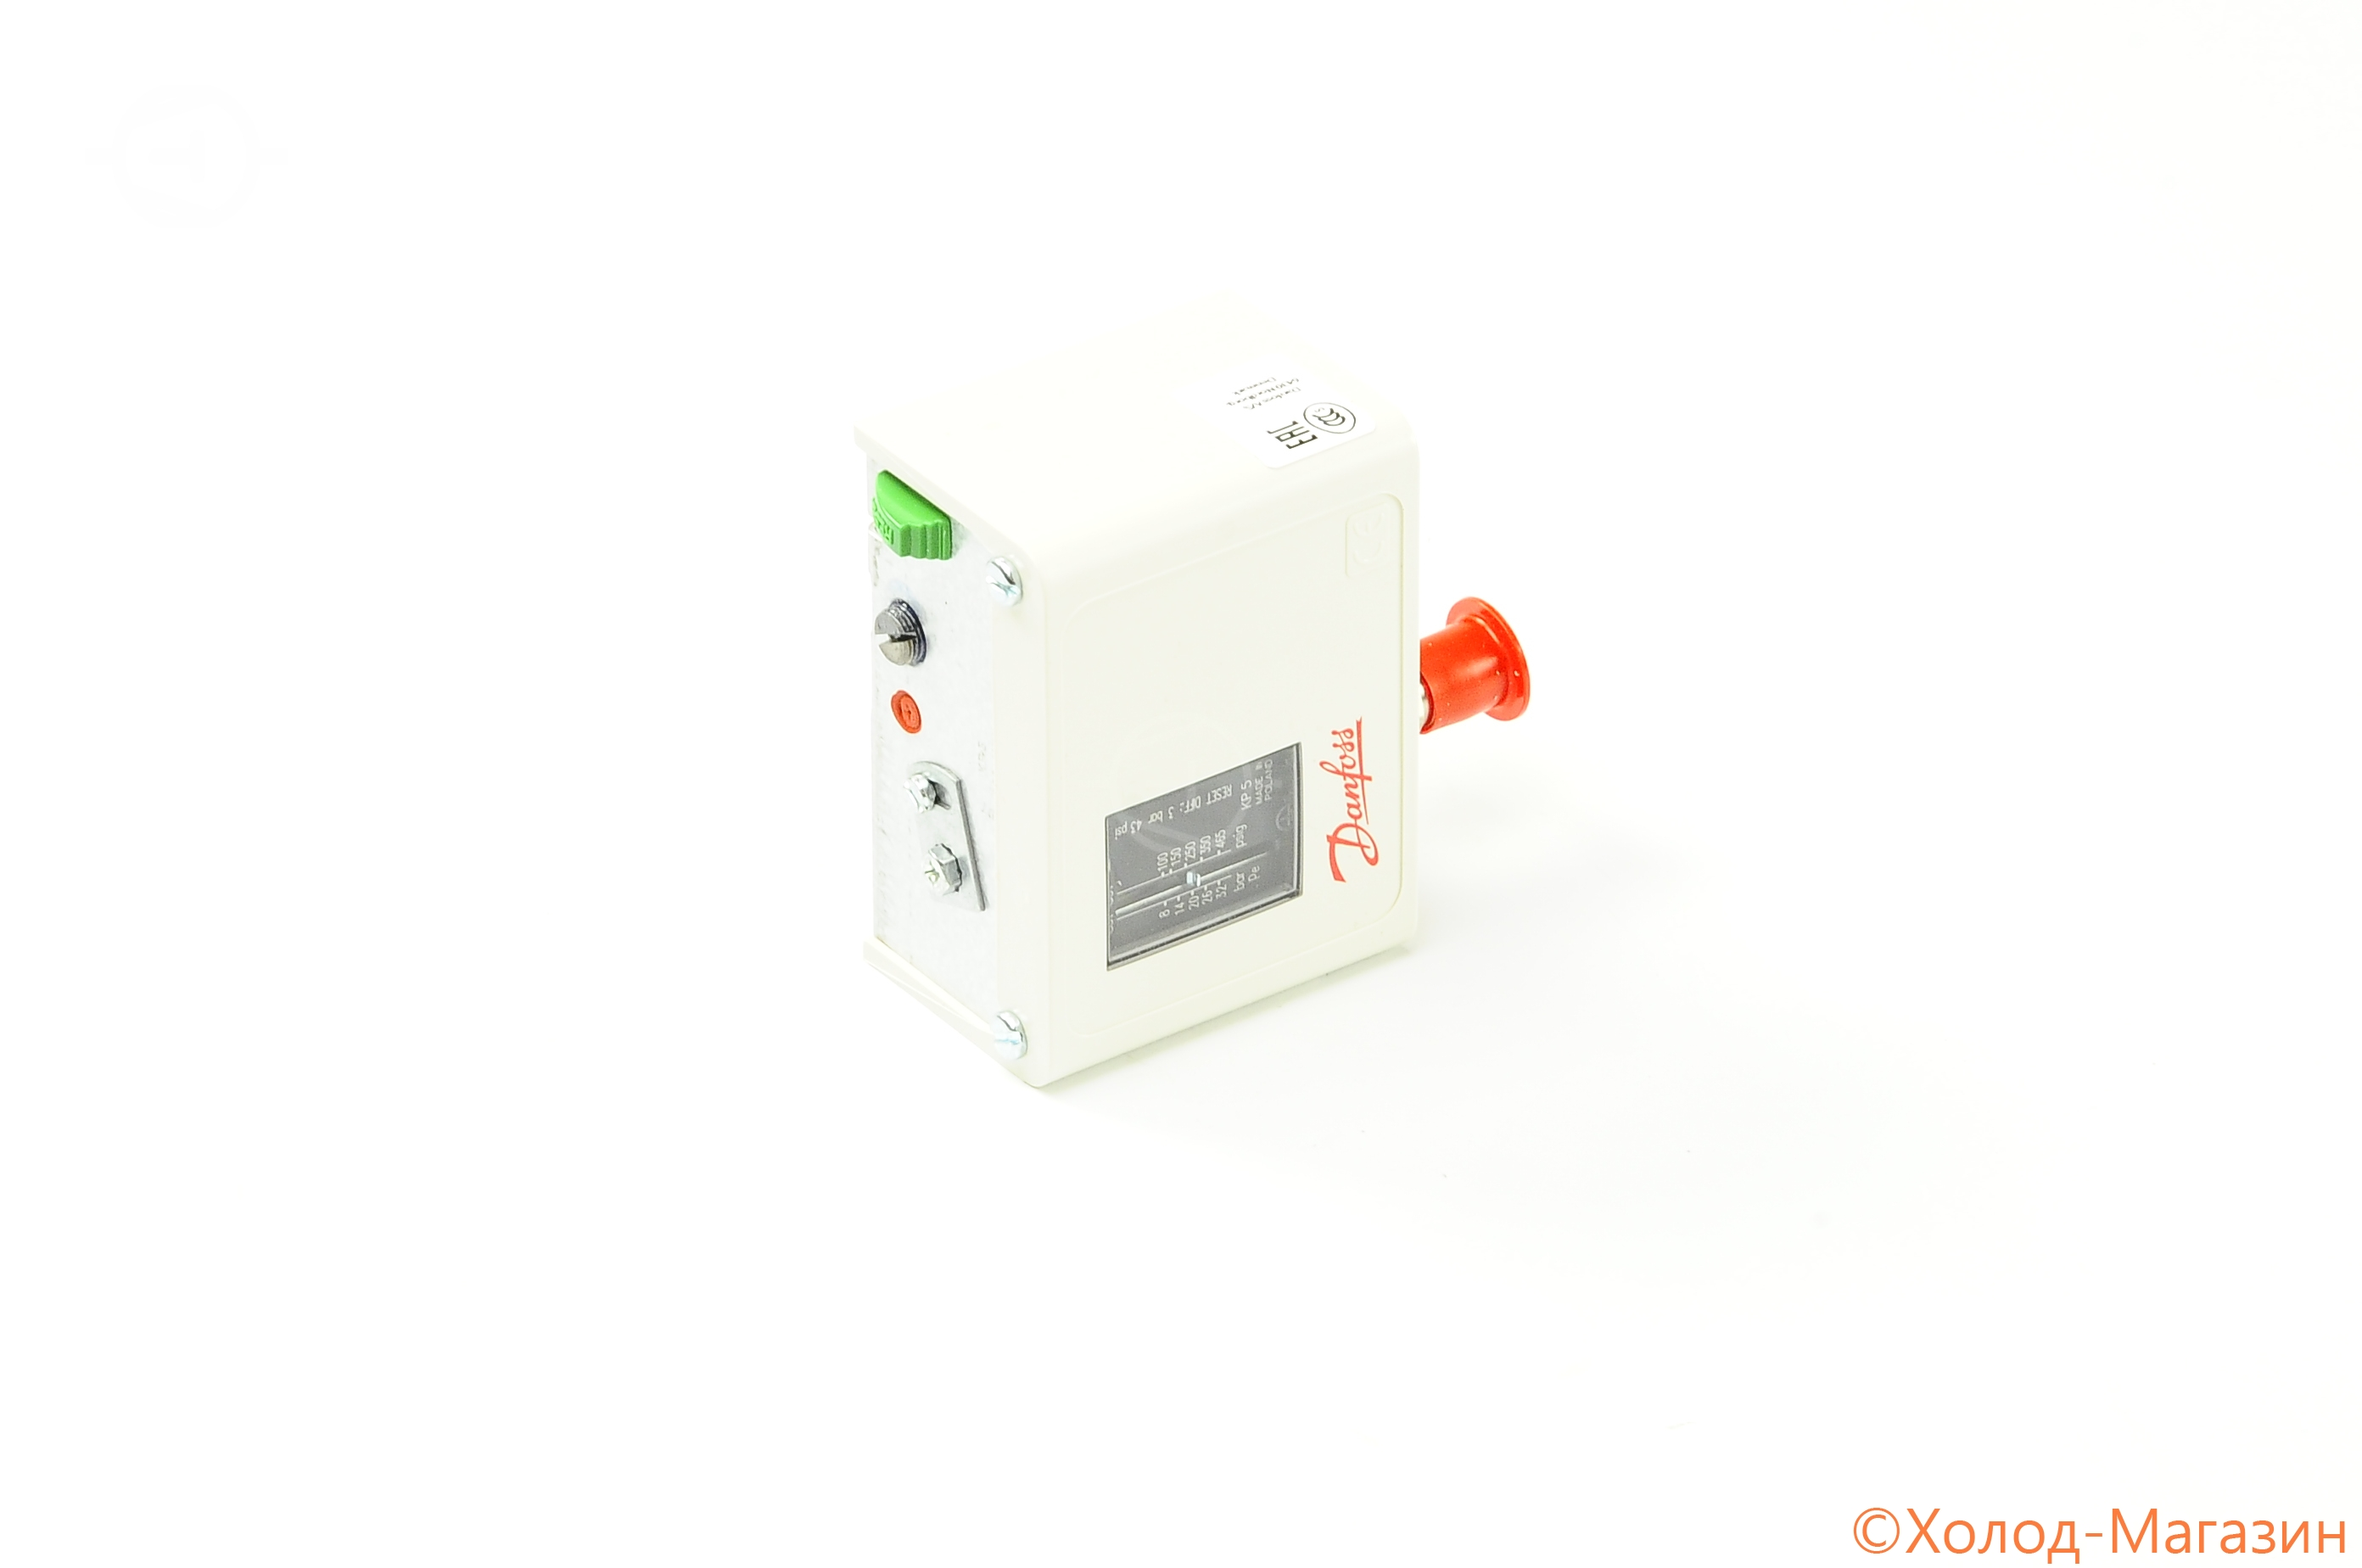 Реле давления (прессостат) KP 5 руч. HP, Danfoss